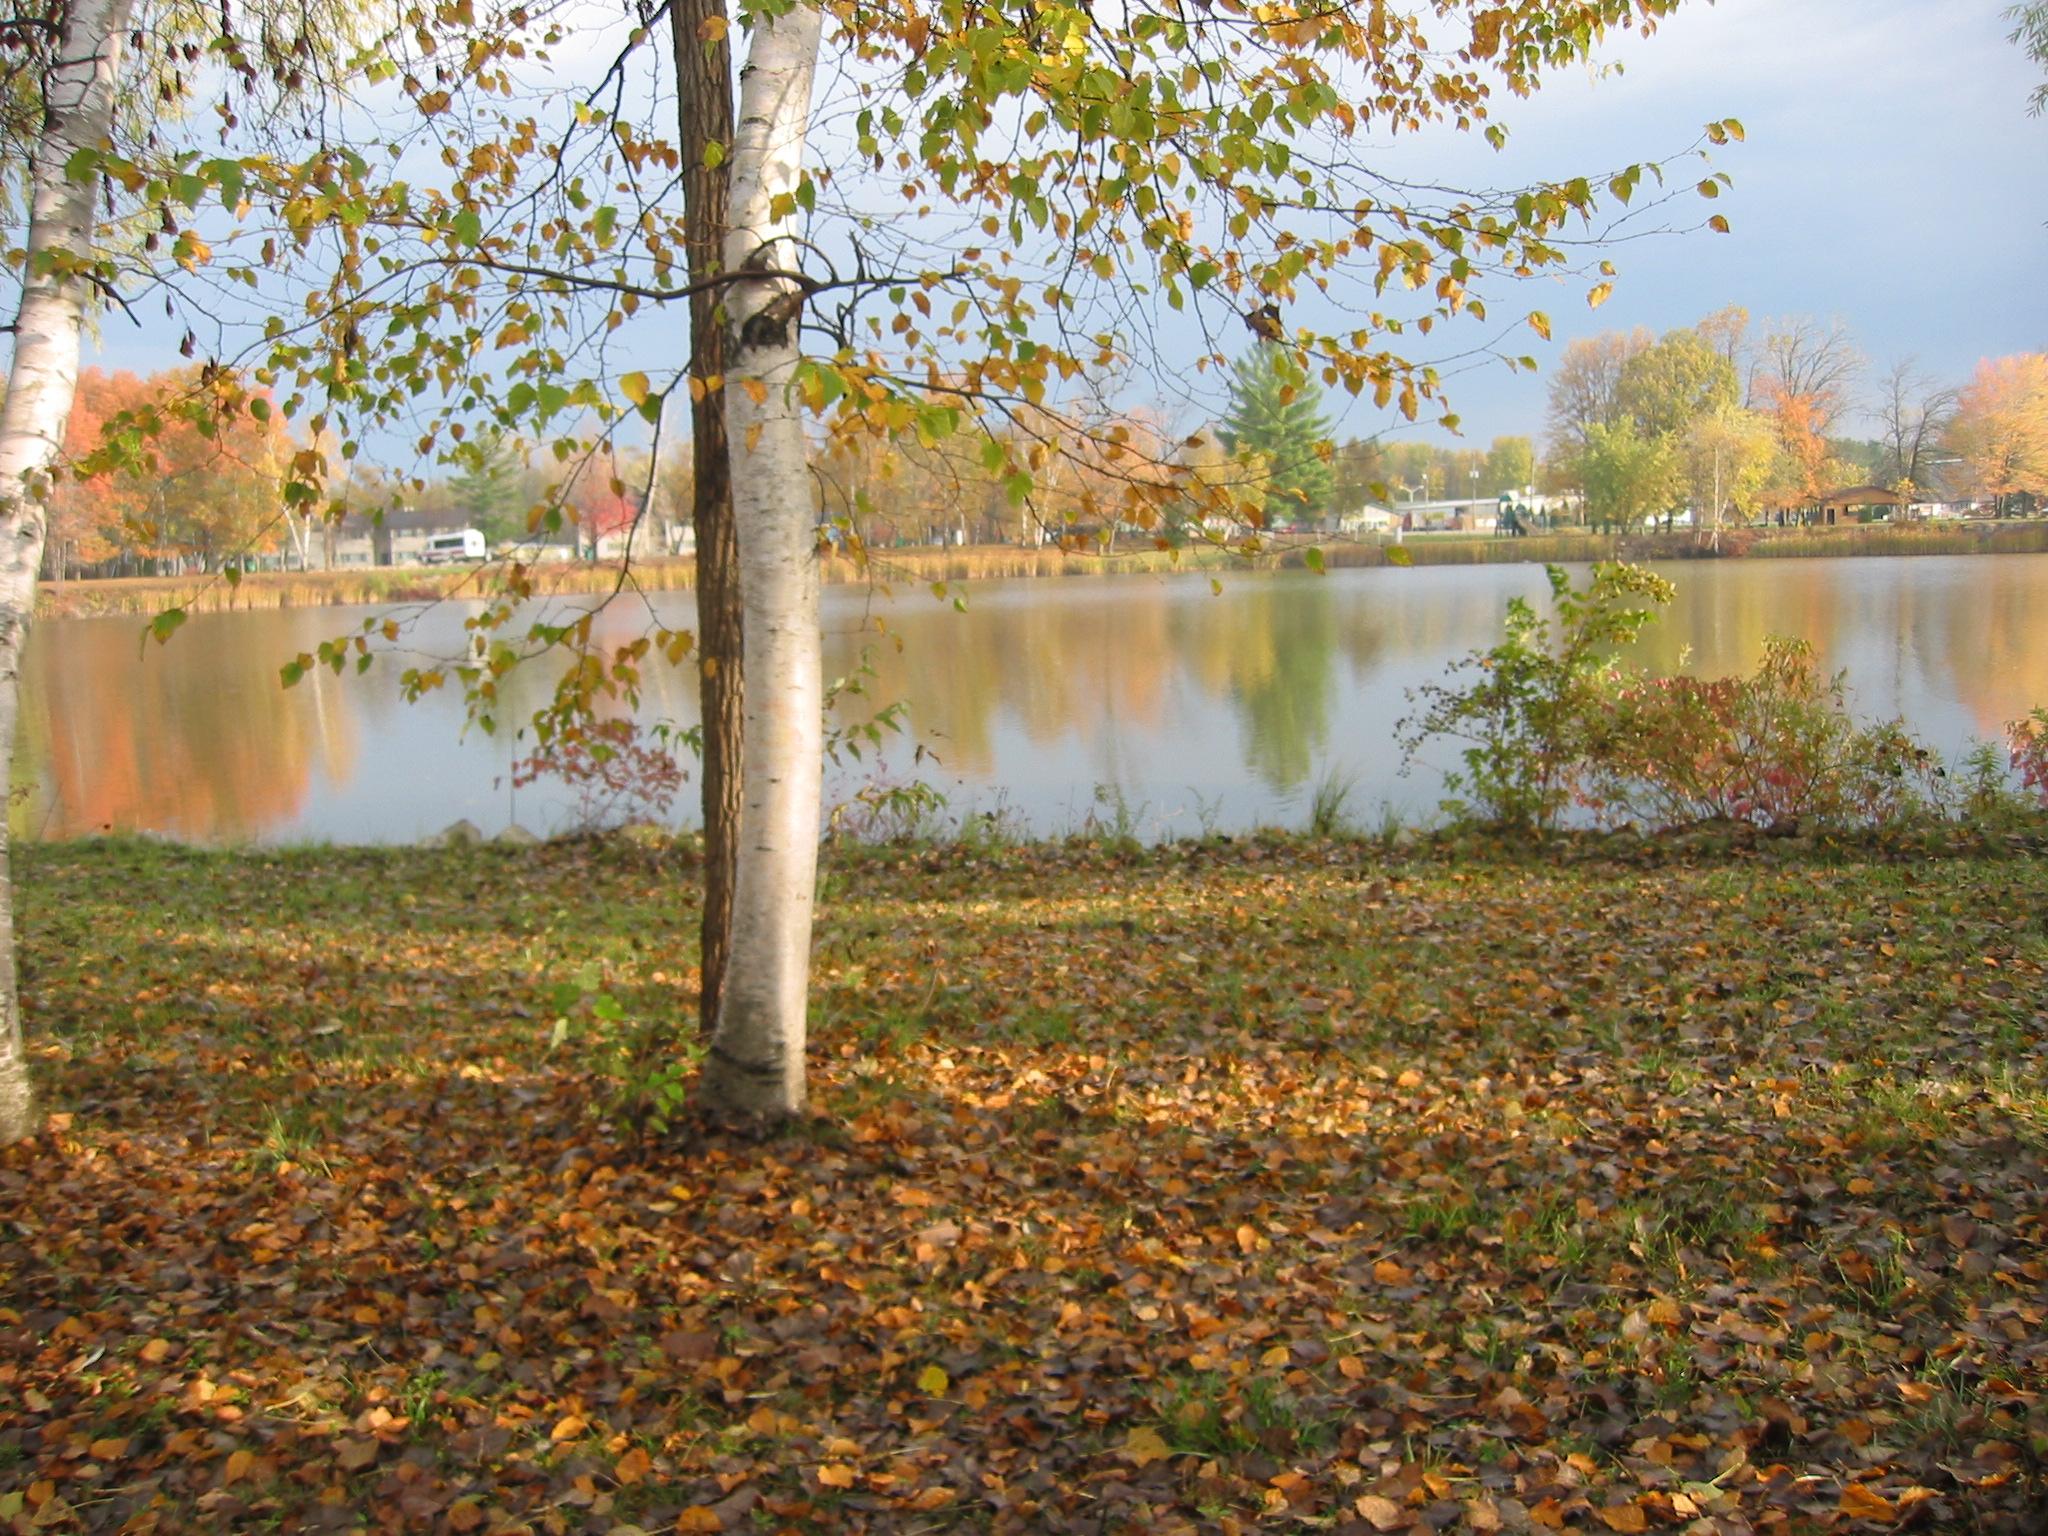 Lot 4 Lakeview, Beaverton, Michigan 48612